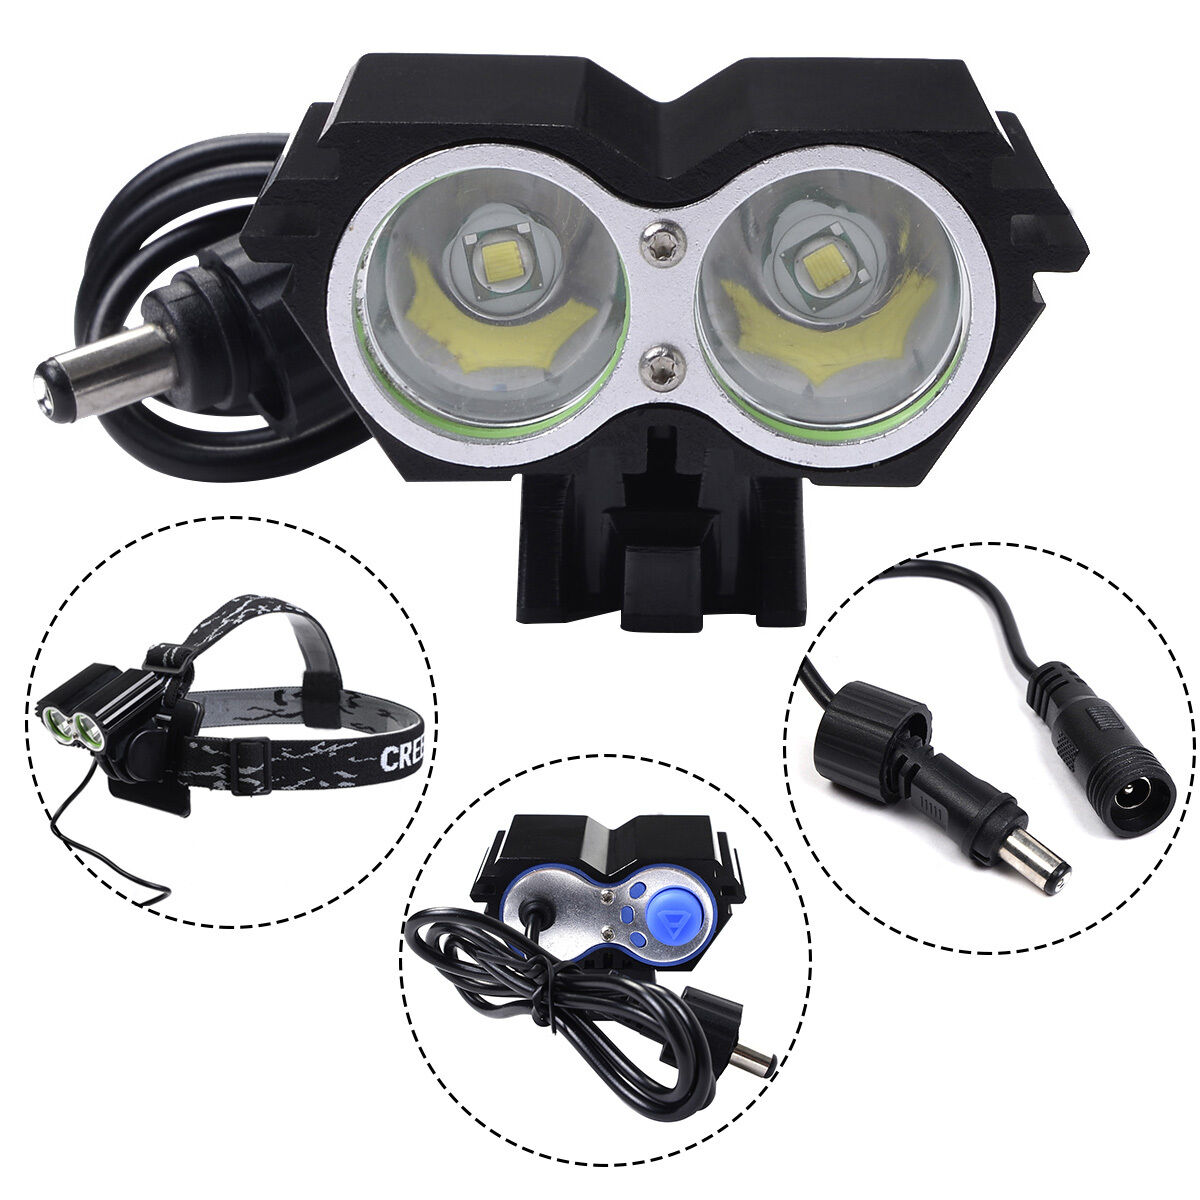 5000 Lumens 2 X Cree Xm L U2 Led Cycling Bike Bicycle Headlight T6 High Power Headlamp Black Picture 1 Of 4